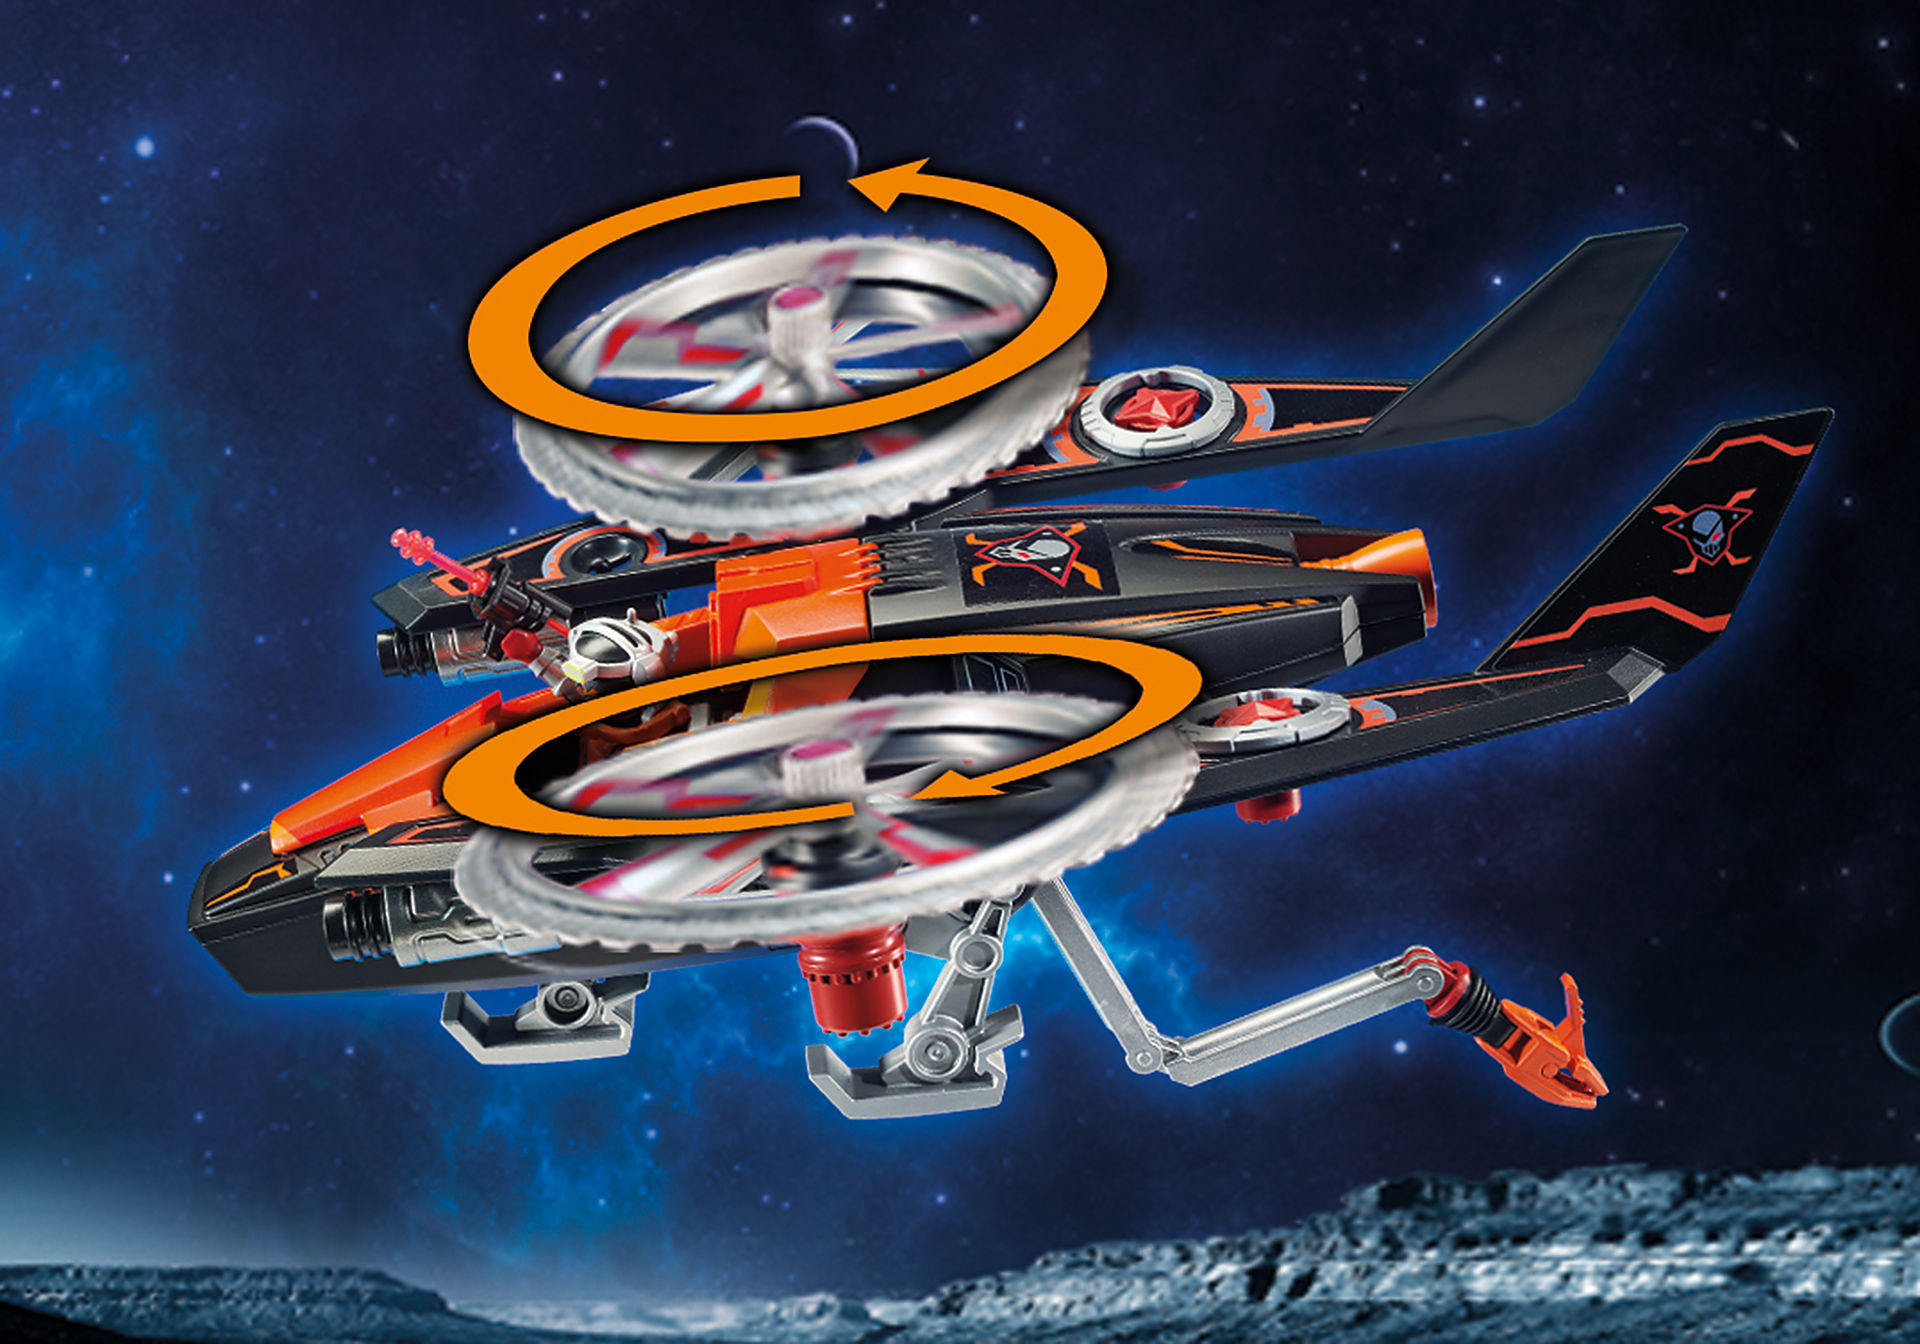 70023 Galaxy piratenhelikopter zoom image4